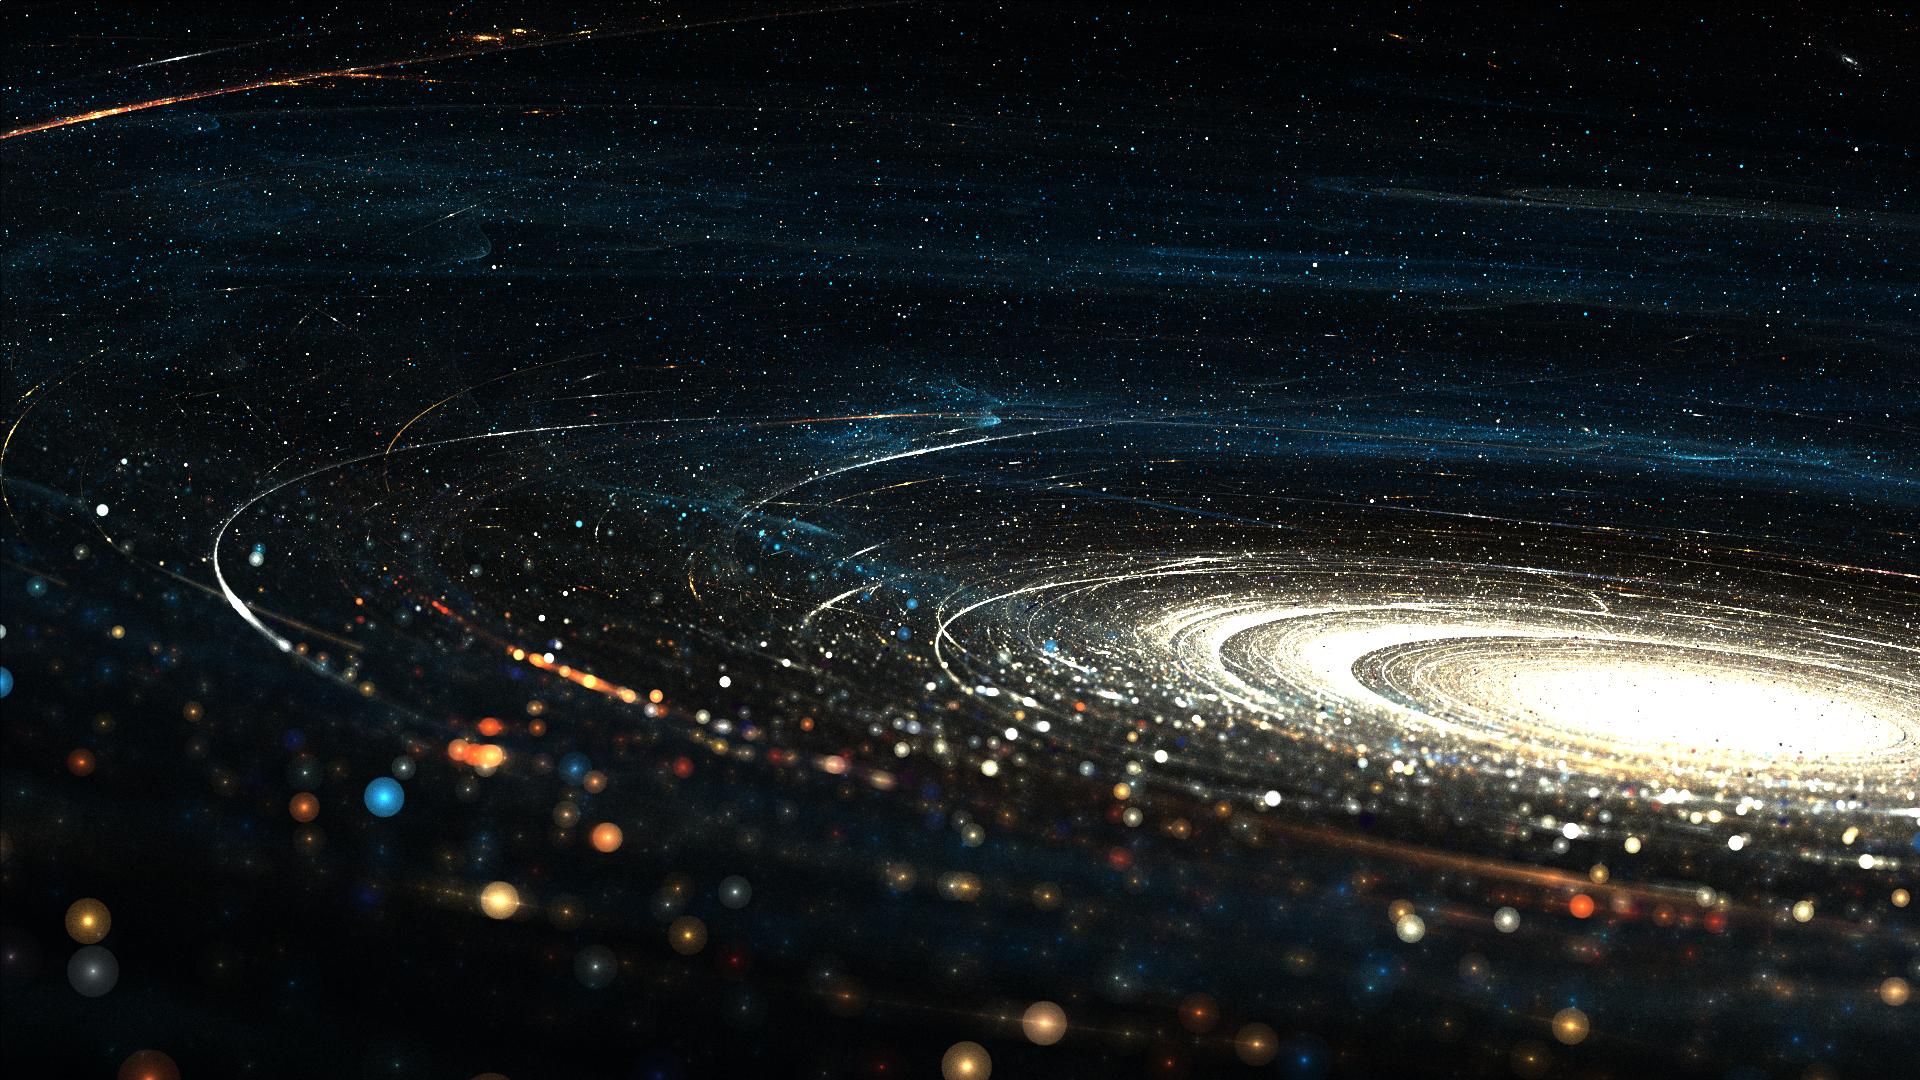 General 1920x1080 galaxy space digital art abstract